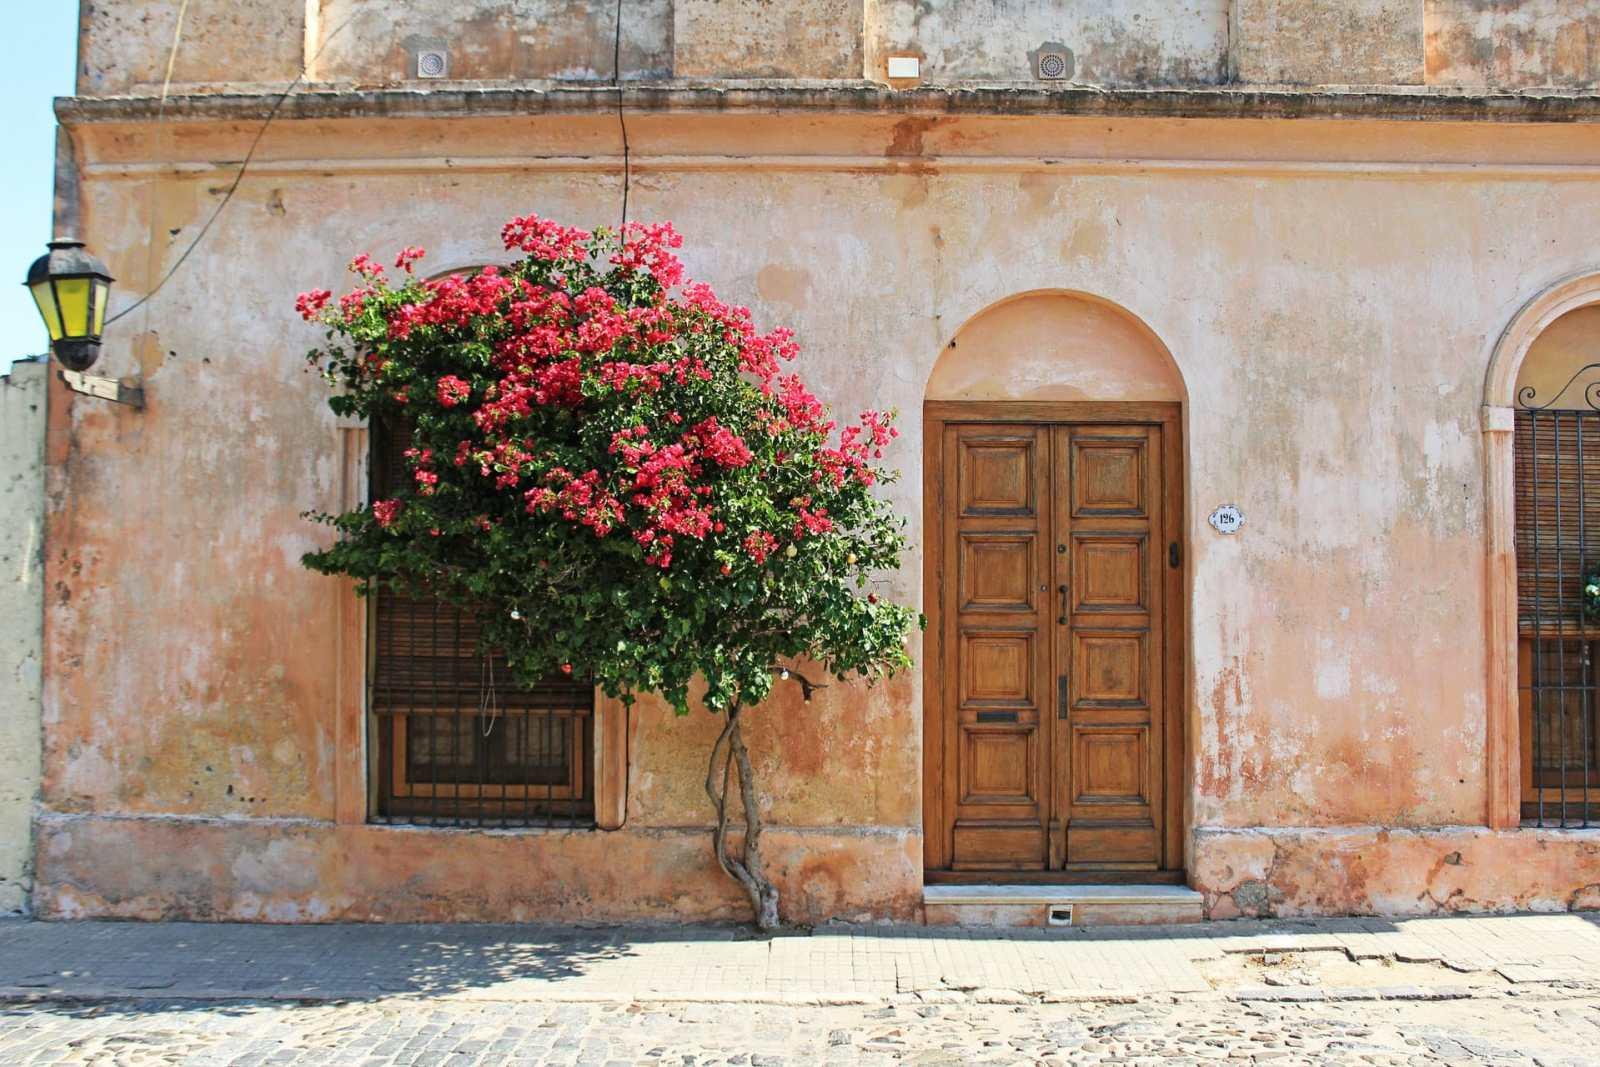 The Best Areas to Stay in Colonia del Sacramento, Uruguay